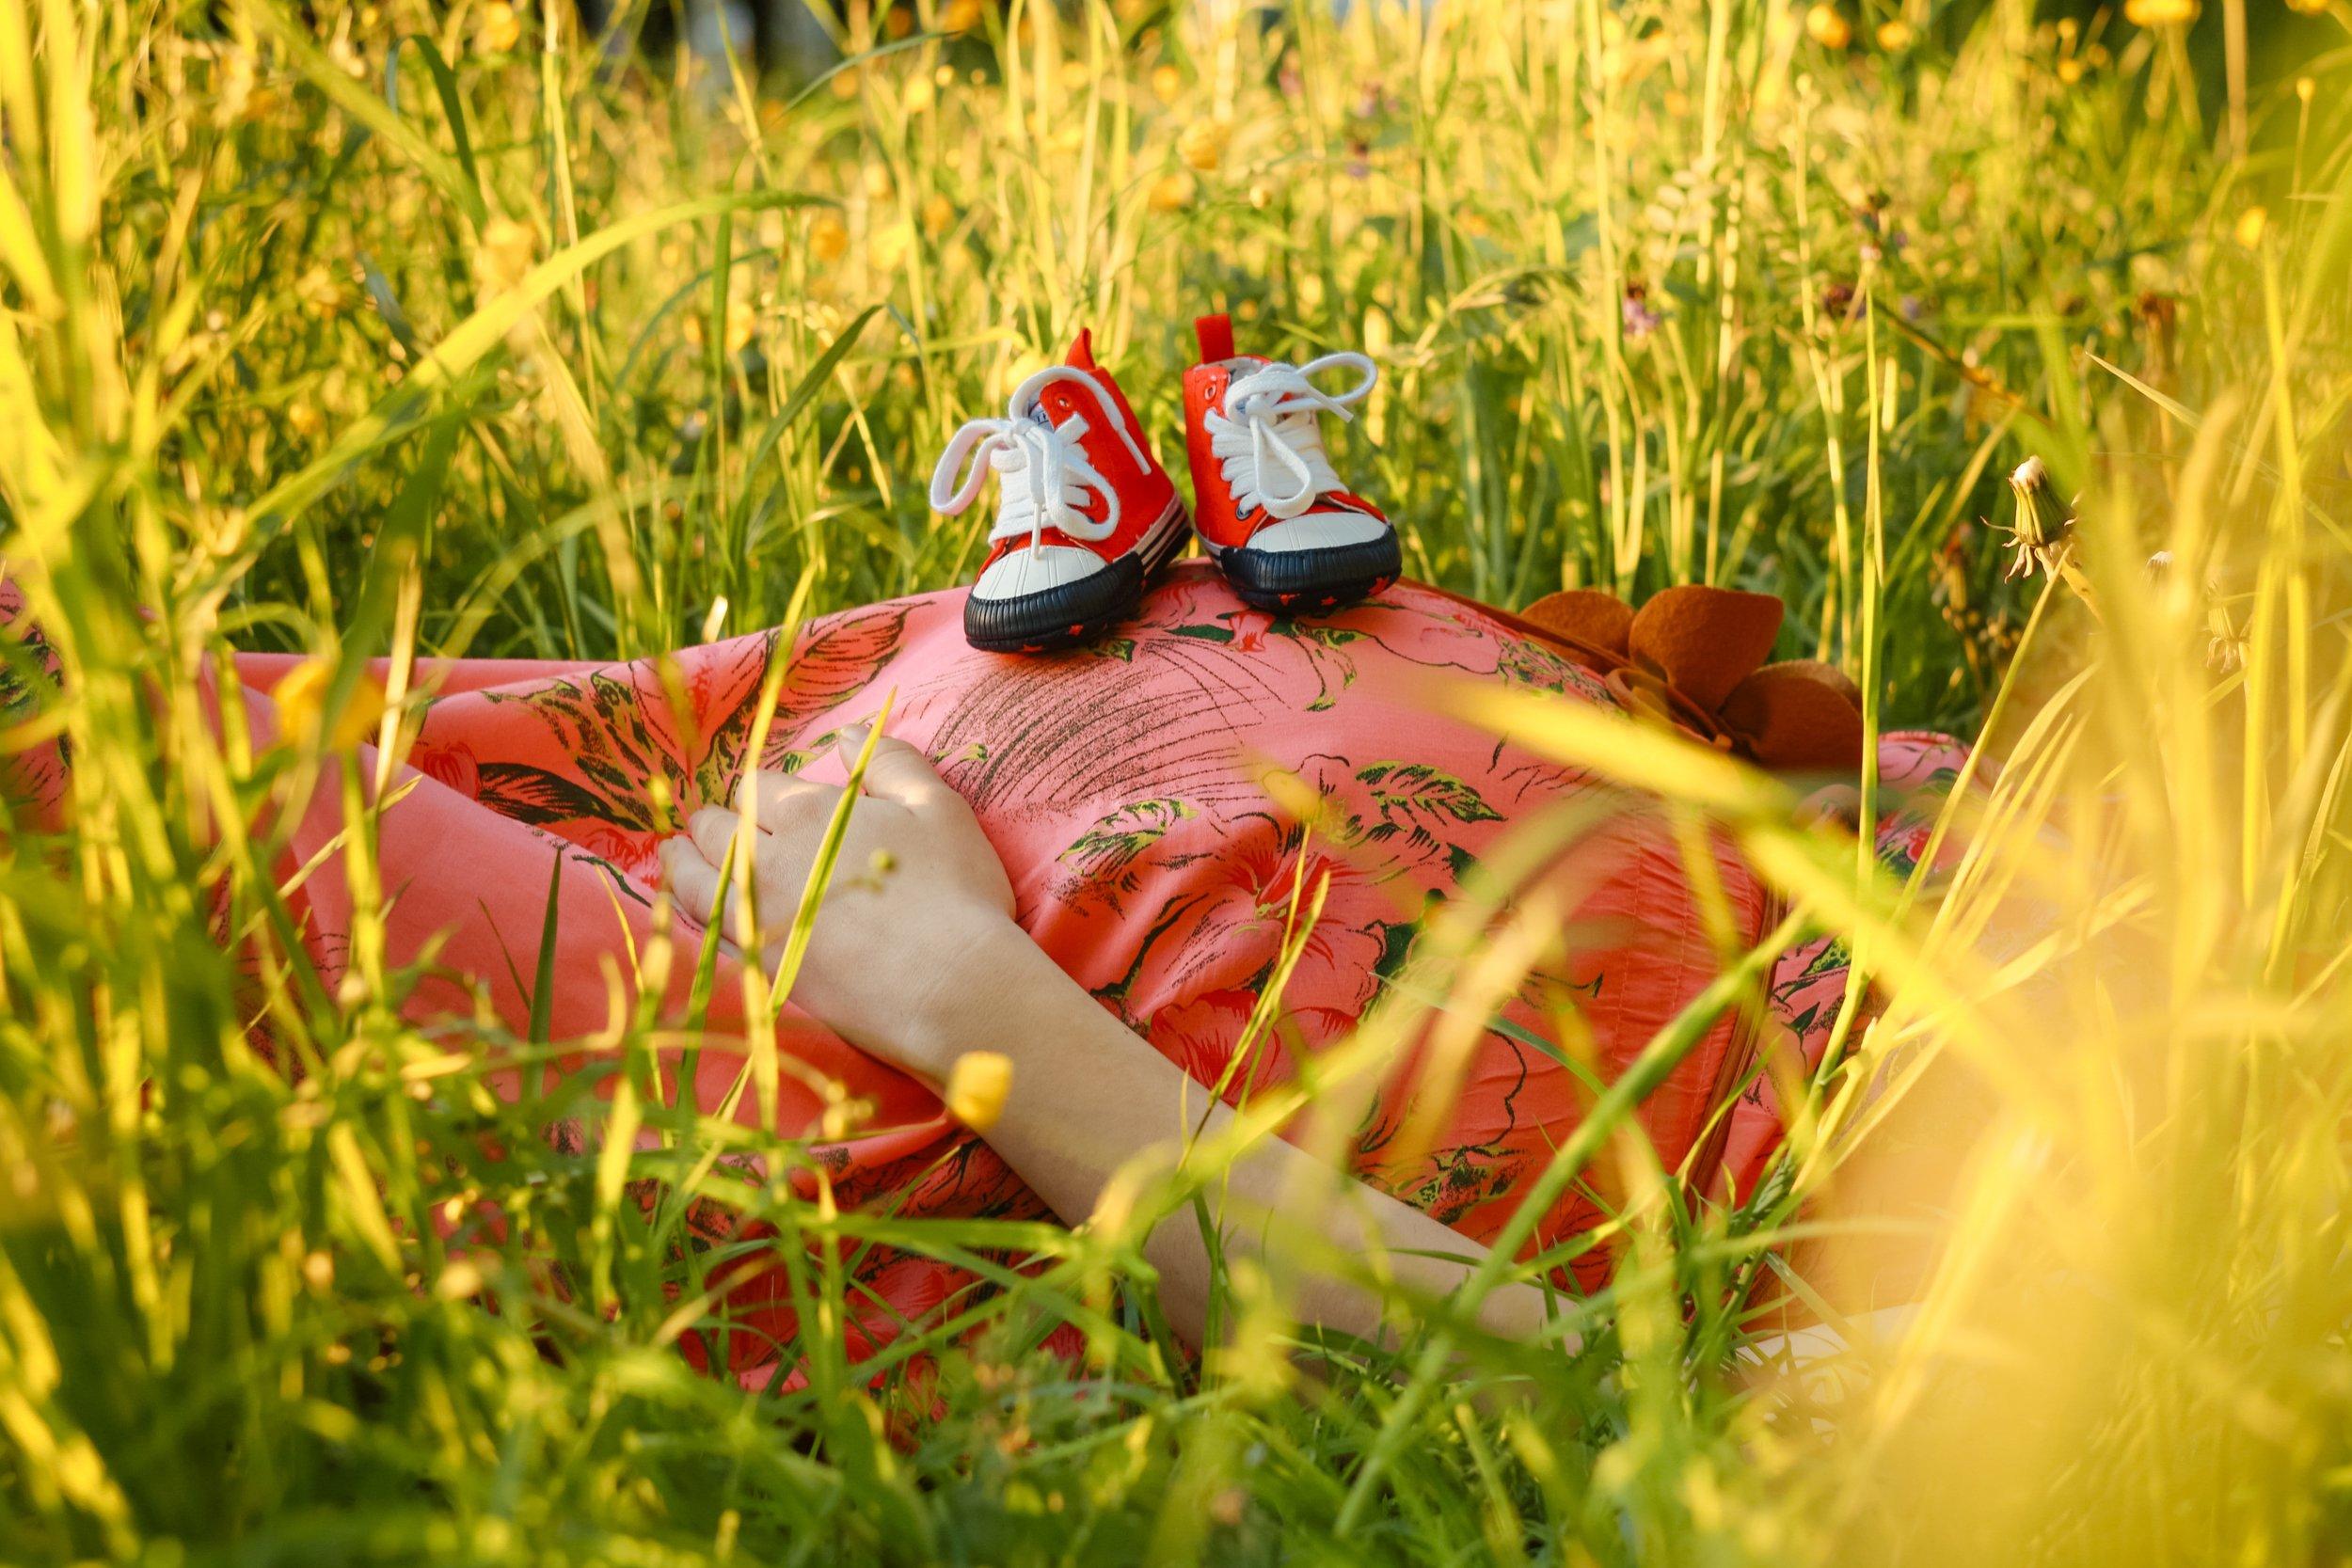 man-nature-grass-plant-woman-field-540316-pxhere.com.jpg